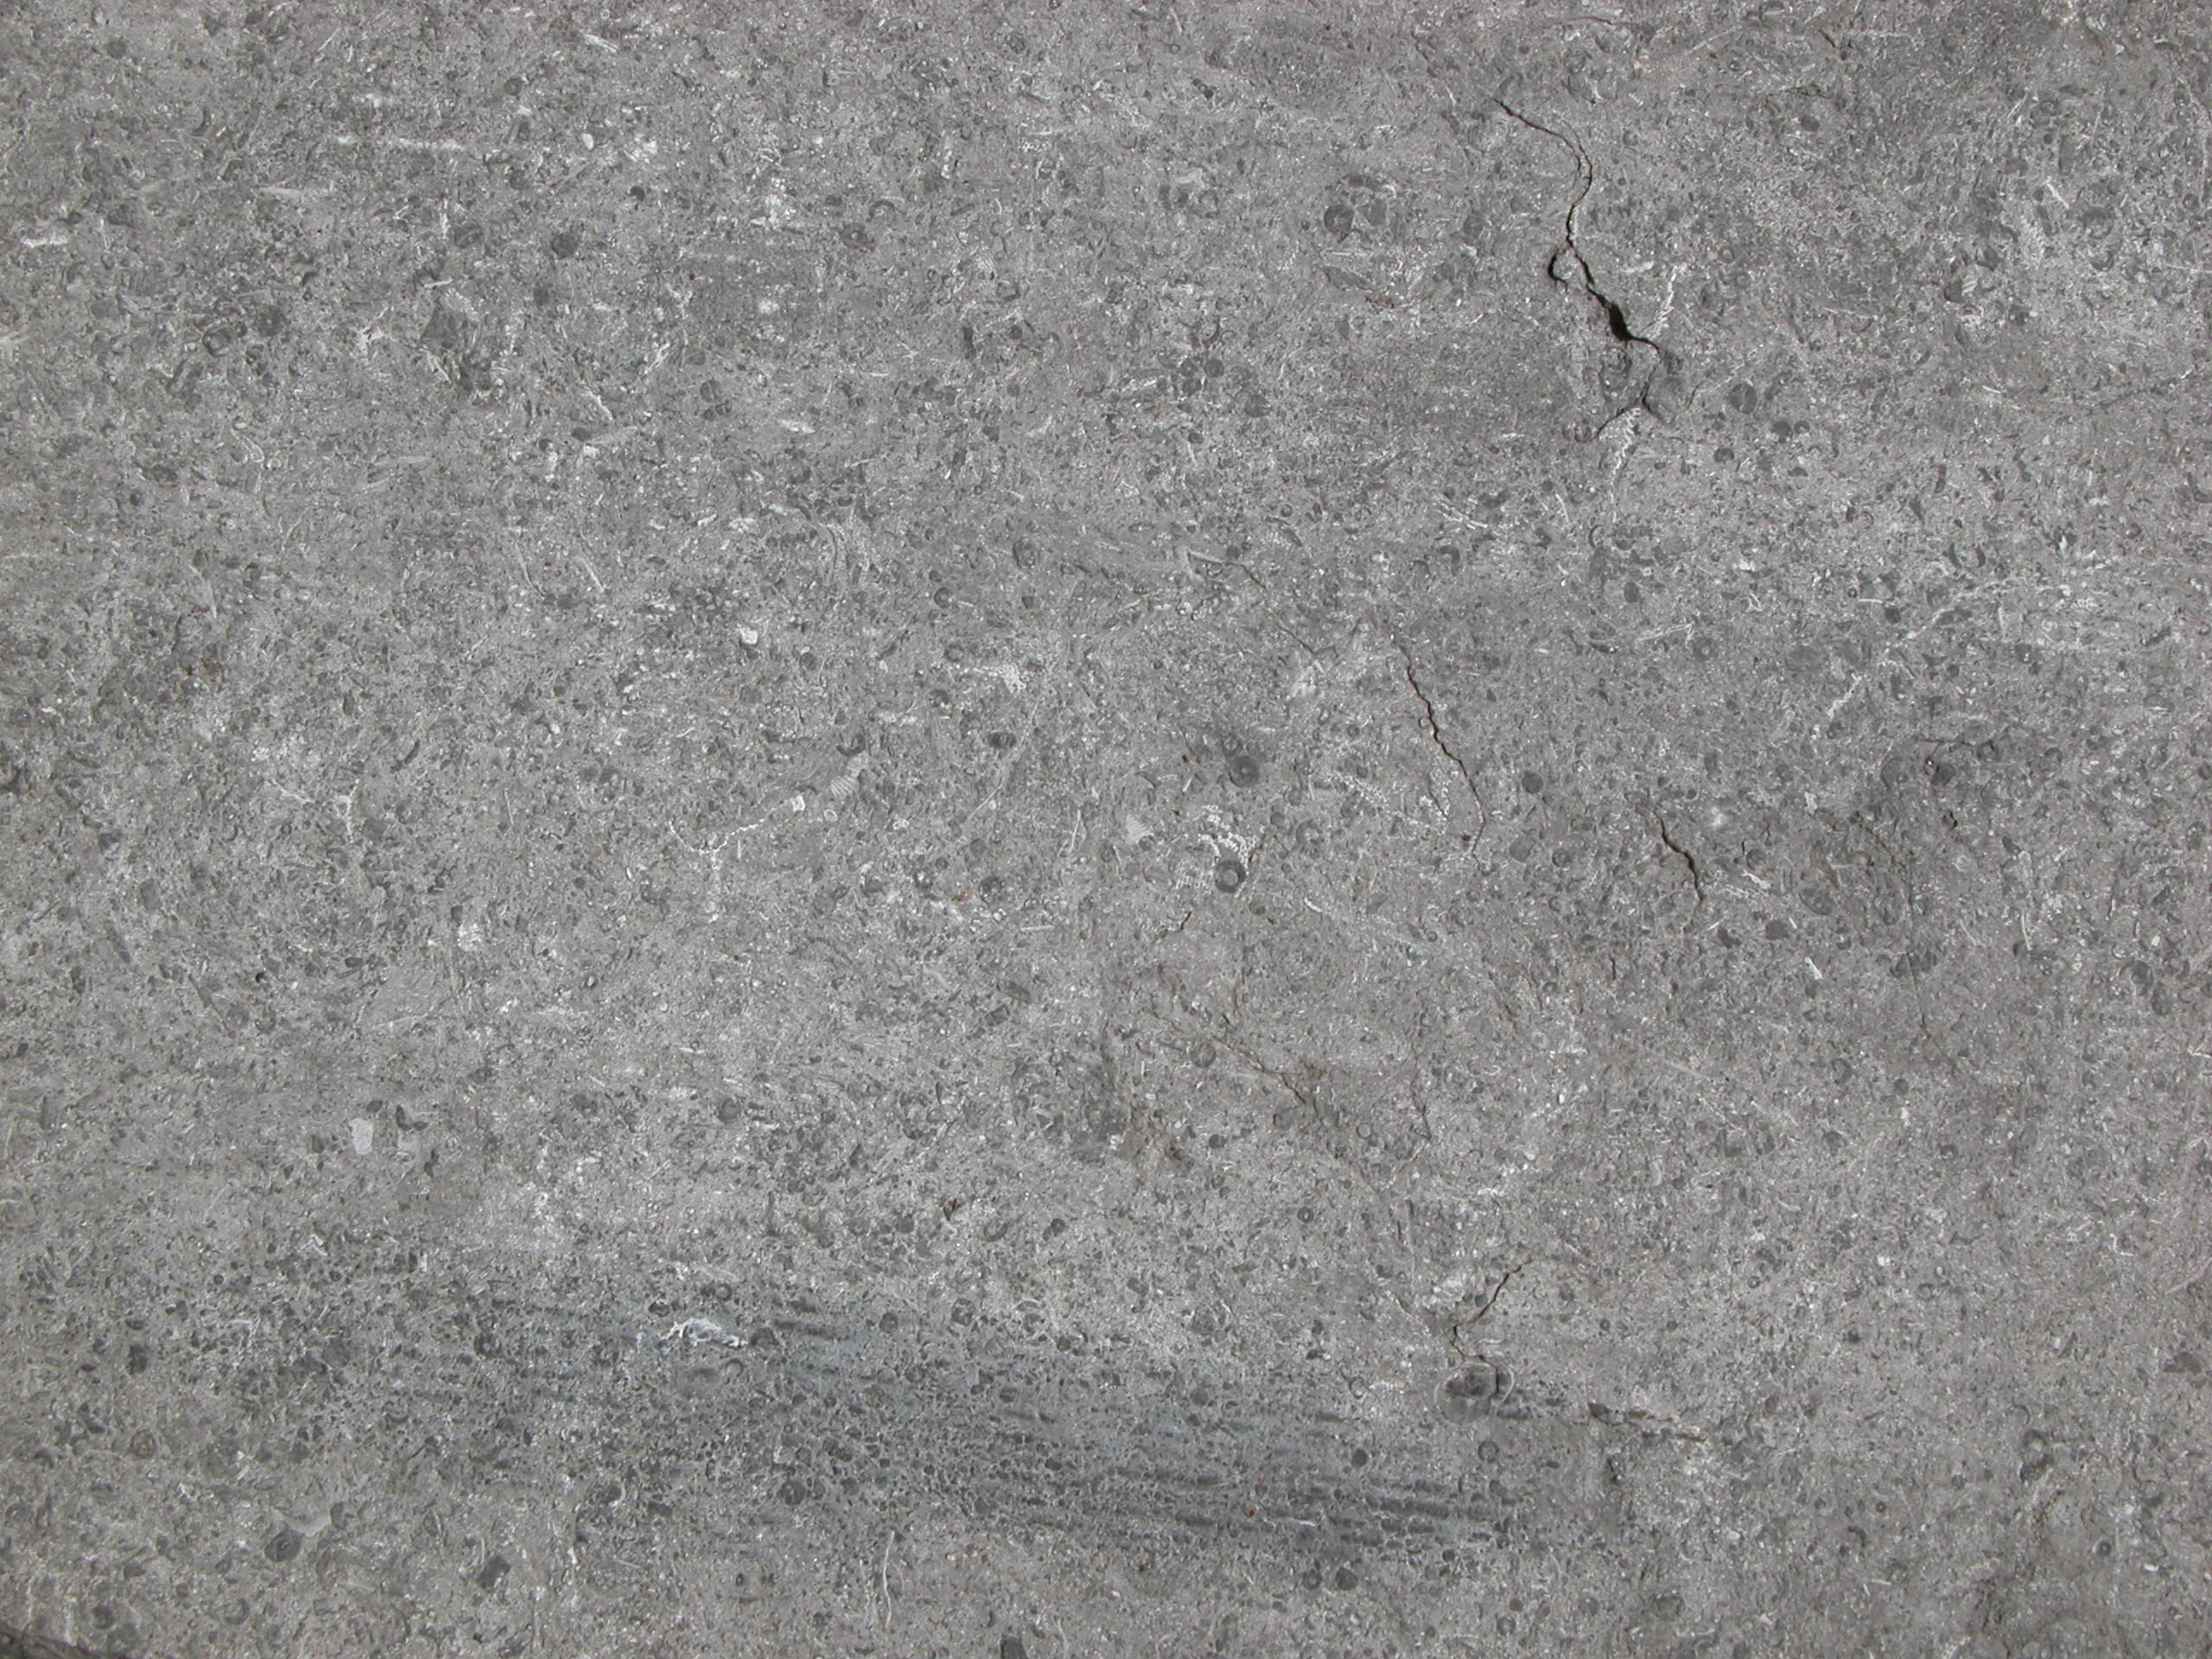 Granite Stone Texture : Image after photos walls texture granite stone rock